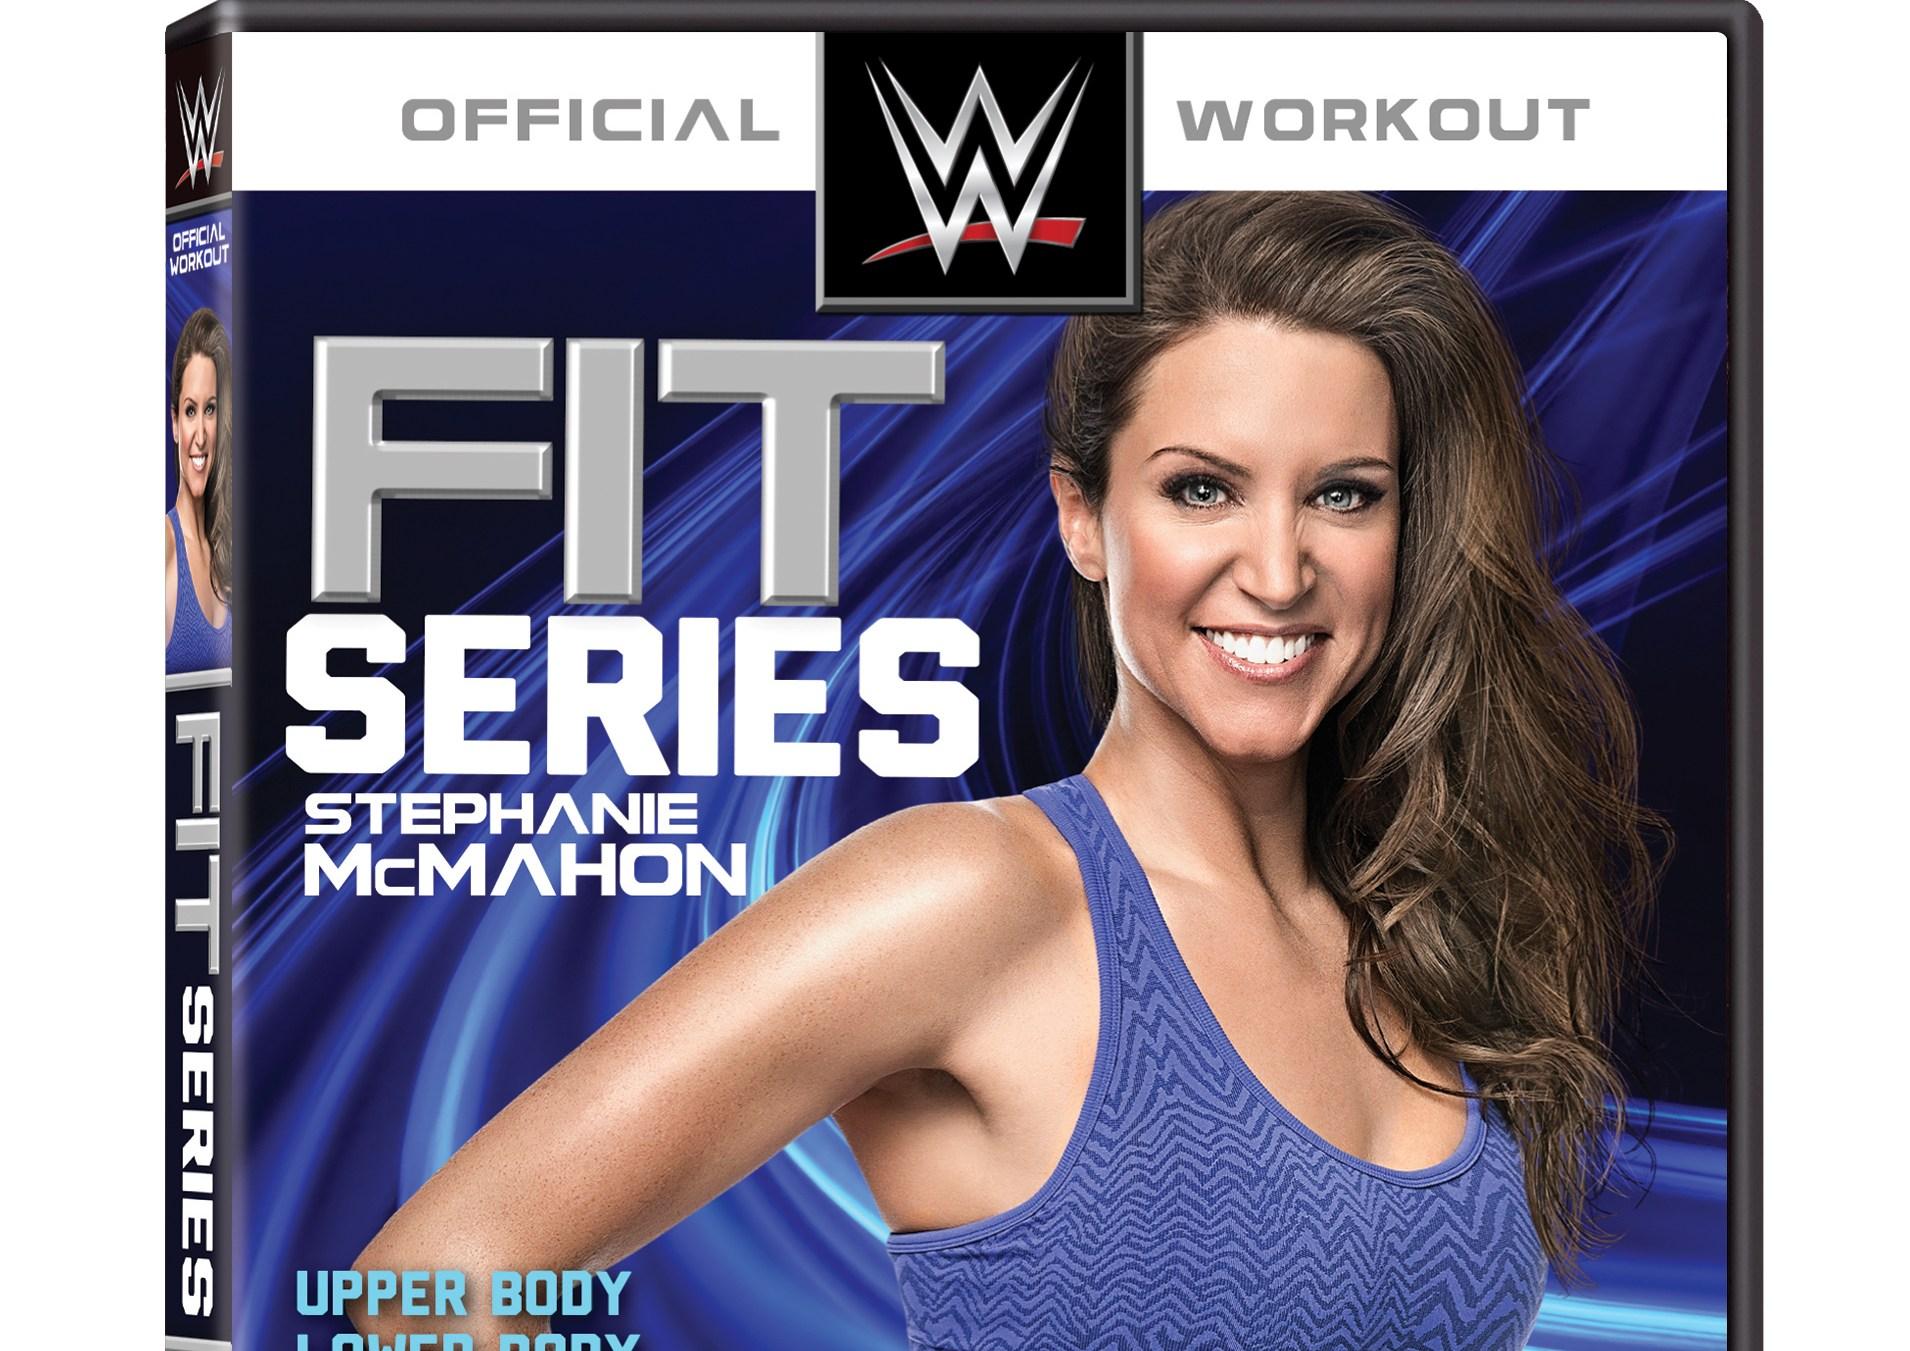 WWE_FS_McMAHON_DVD_3D_SKEW